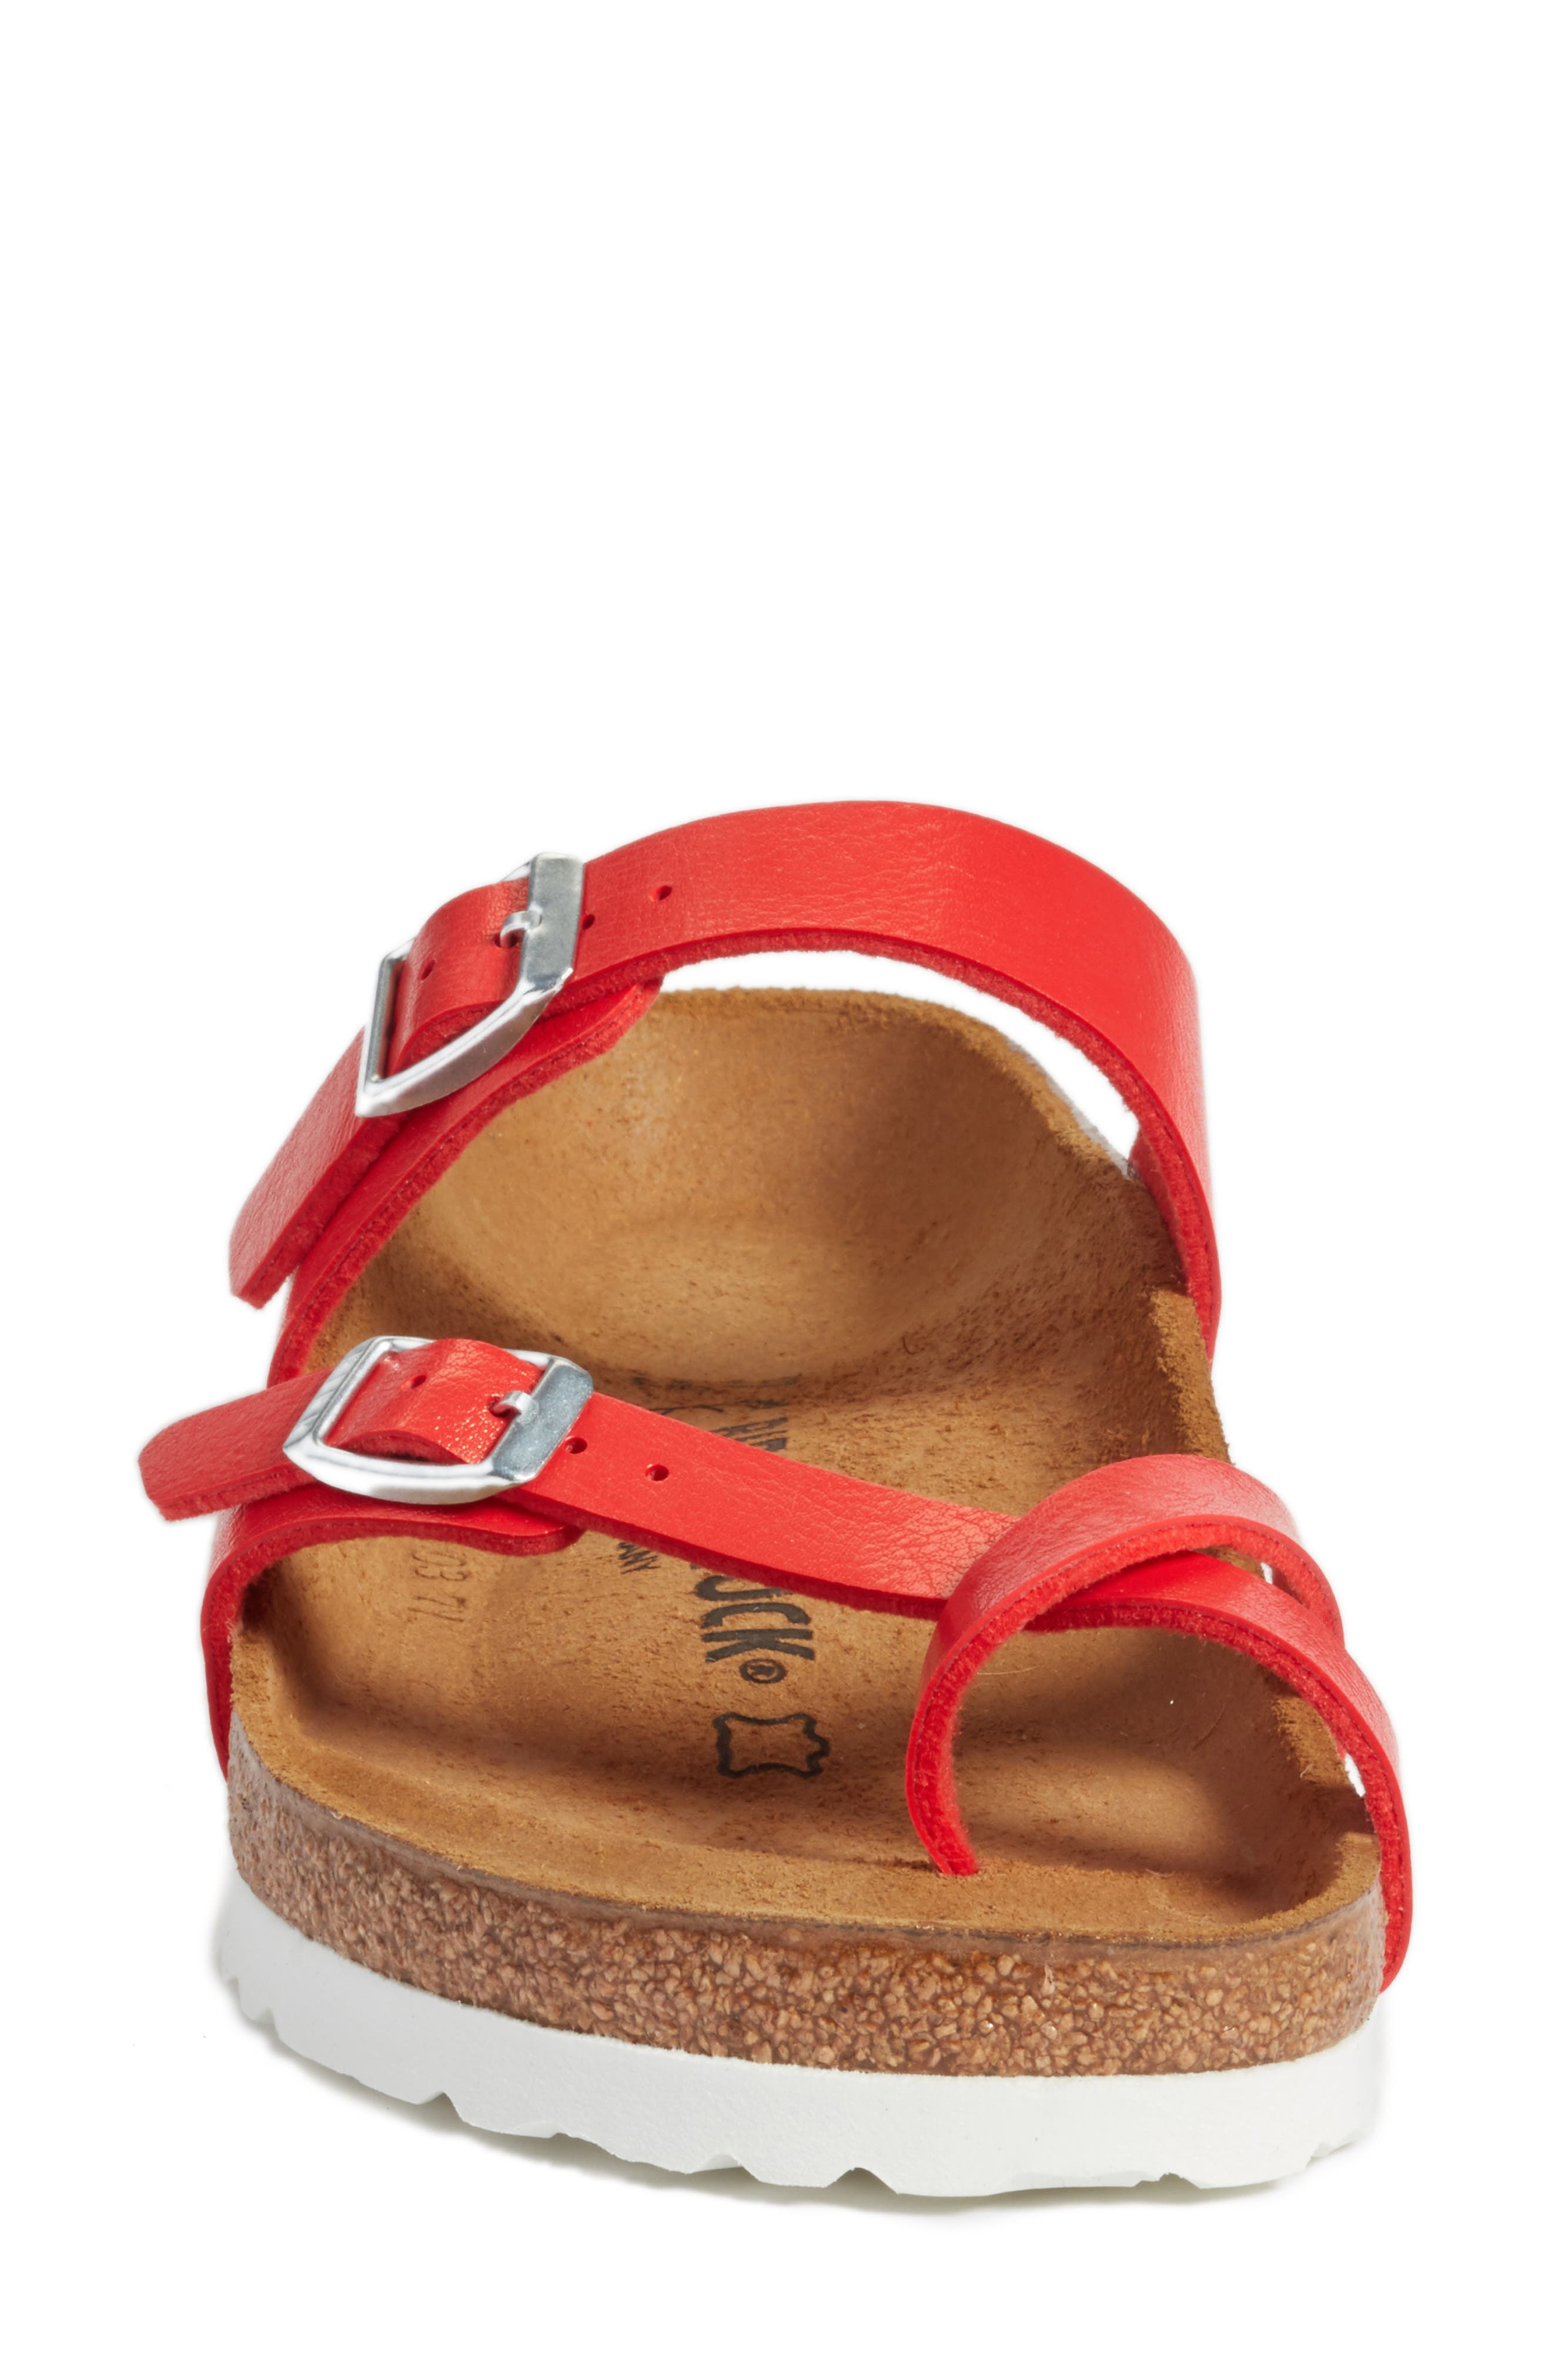 'Mayari' Birko-Flor<sup>™</sup> Sandal,                             Alternate thumbnail 4, color,                             Graceful Hibiscus Leather